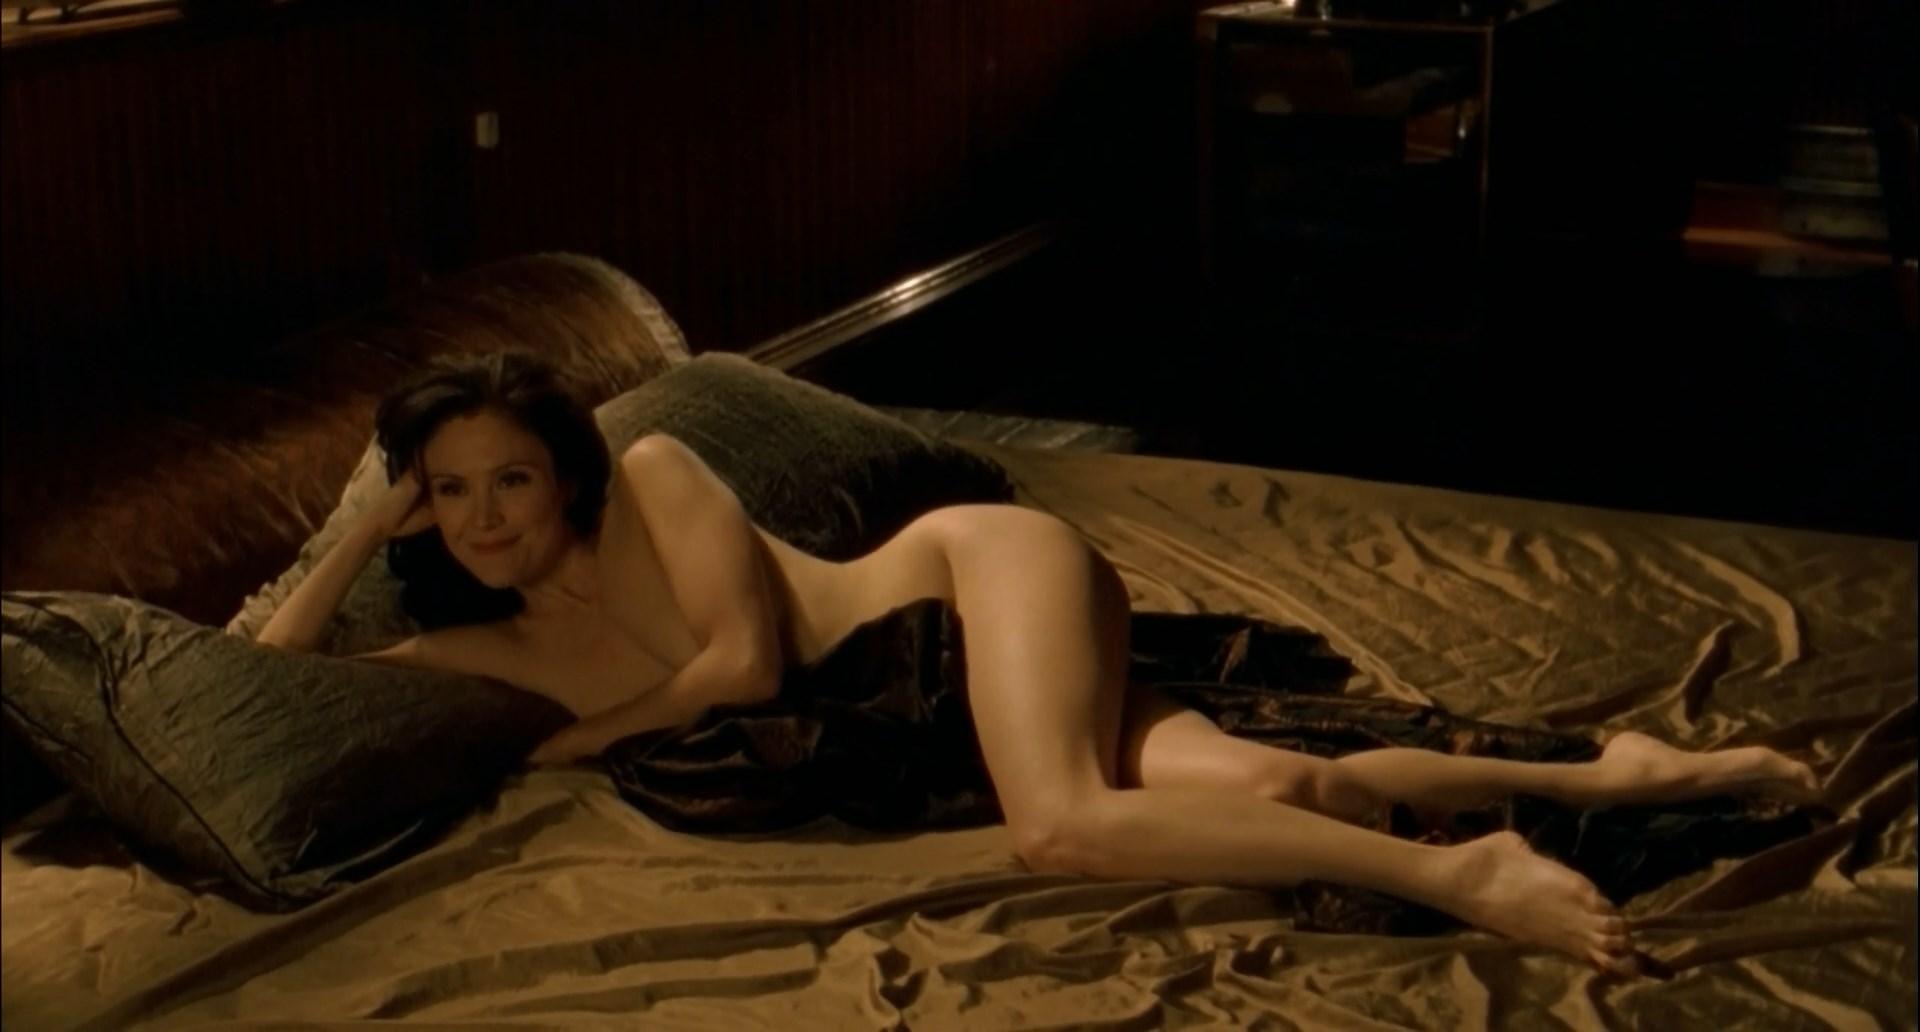 Reiko Aylesworth, Shiri Appleby - The Killing Floor (2007) HD 1080p